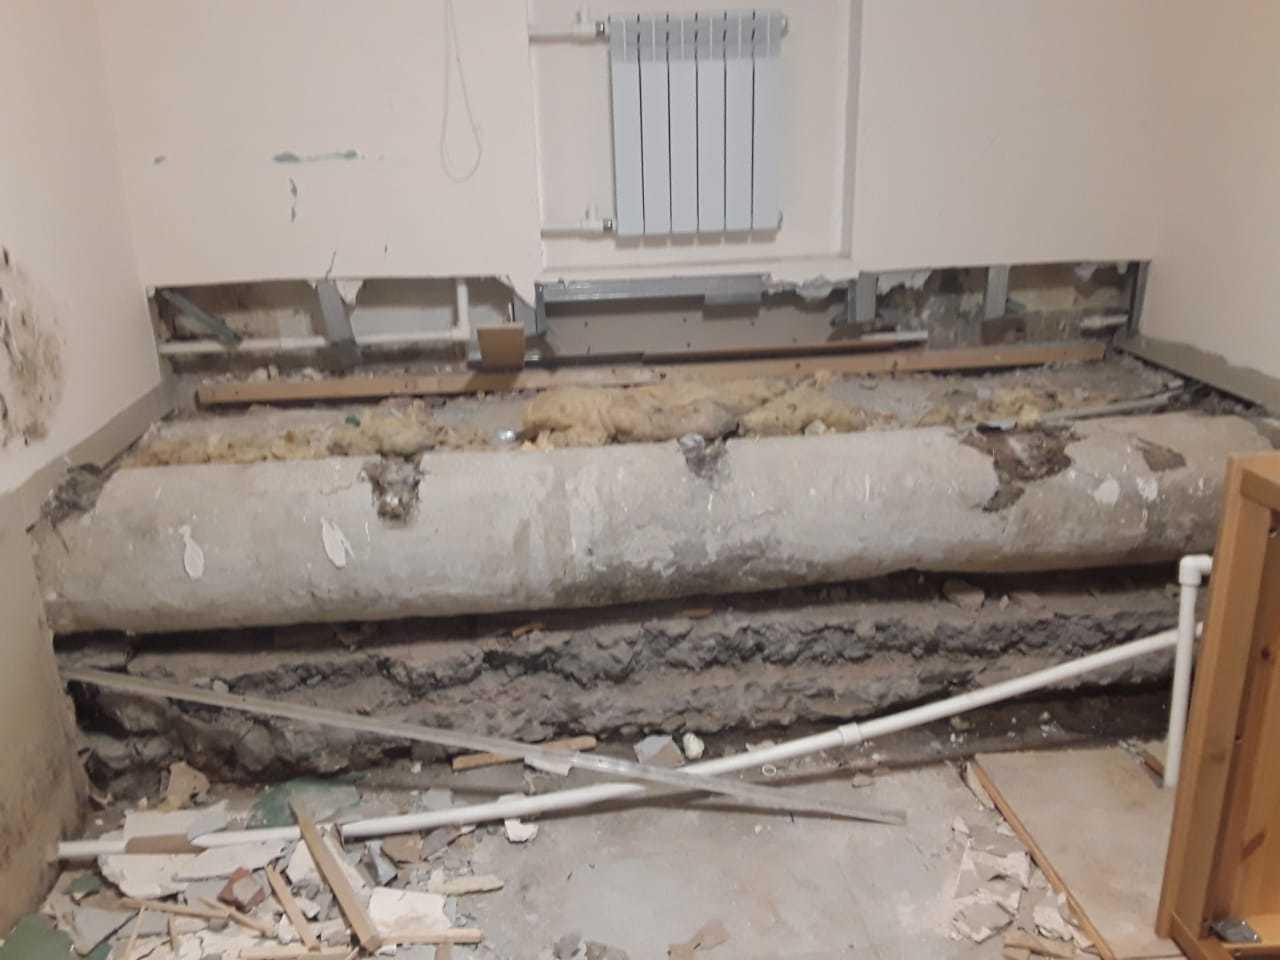 фото ЗакС политика На Черной речке выселяют хостел, в котором кровати стояли на трубах с кипятком